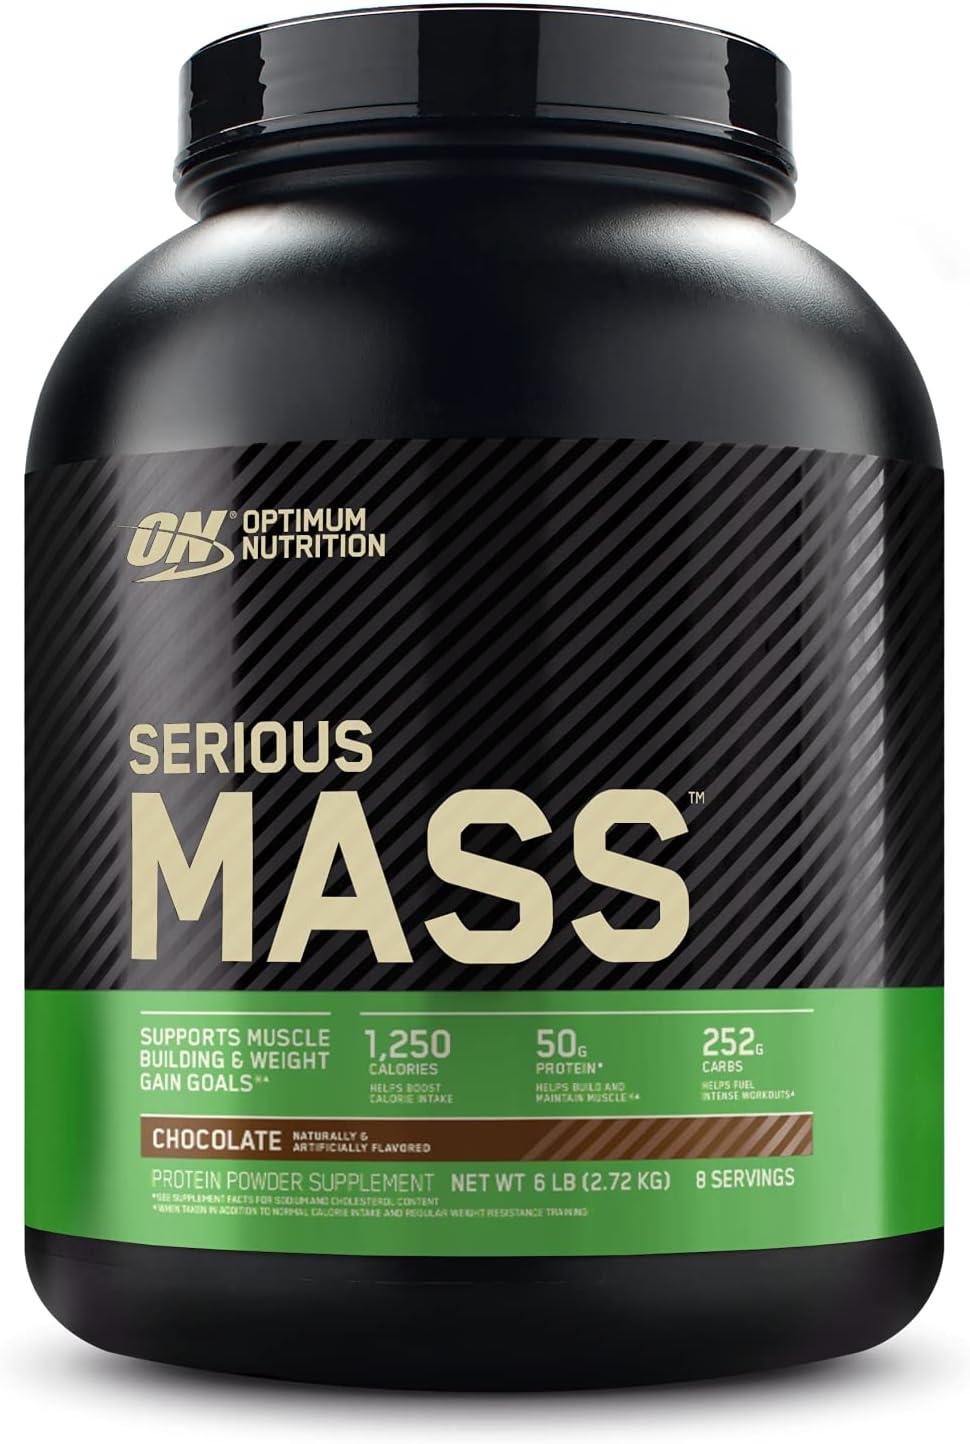 Optimum Nutrition Serious Mass - Best Whey Powders